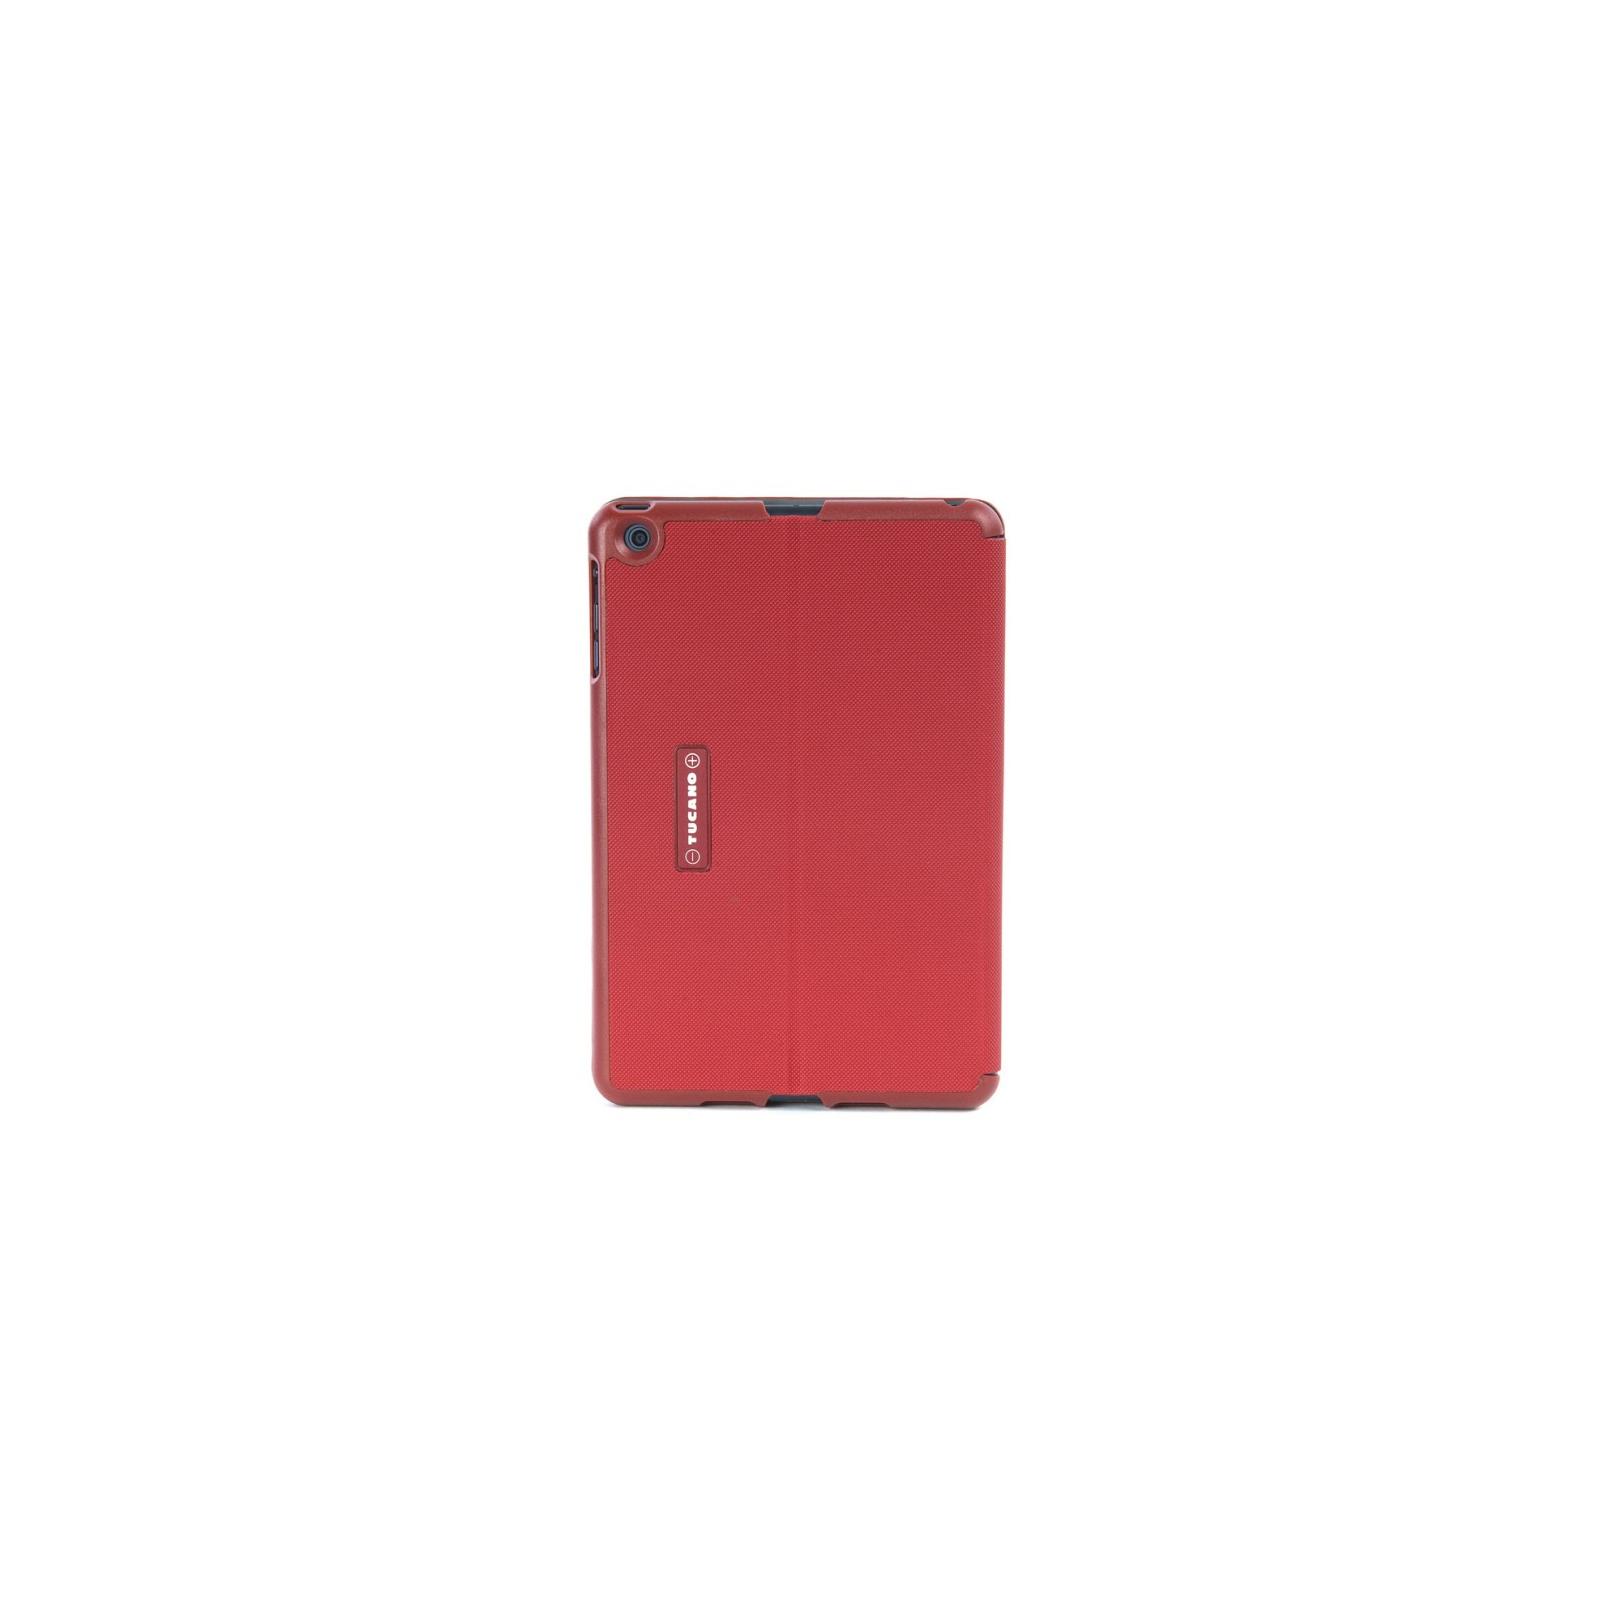 Чехол для планшета Tucano iPad Air Palmo Red (IPD5PA-R) изображение 4